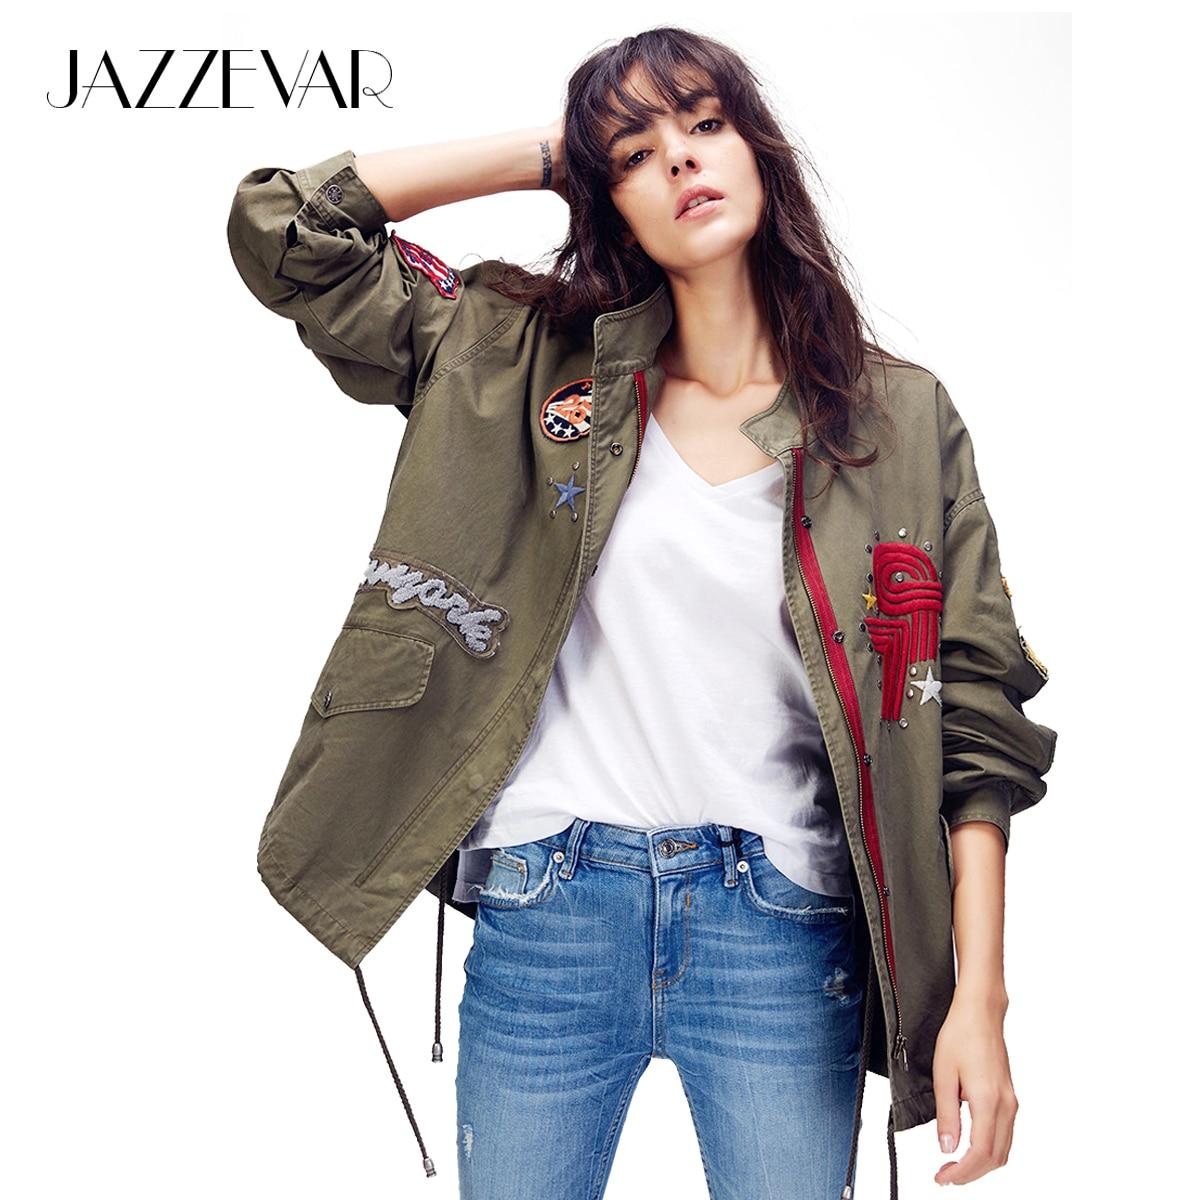 JAZZEVAR 2019 Autumn New Women s Embroidery Rivet Casual Cotton zipper jacket appliques Vintage Washed Loose